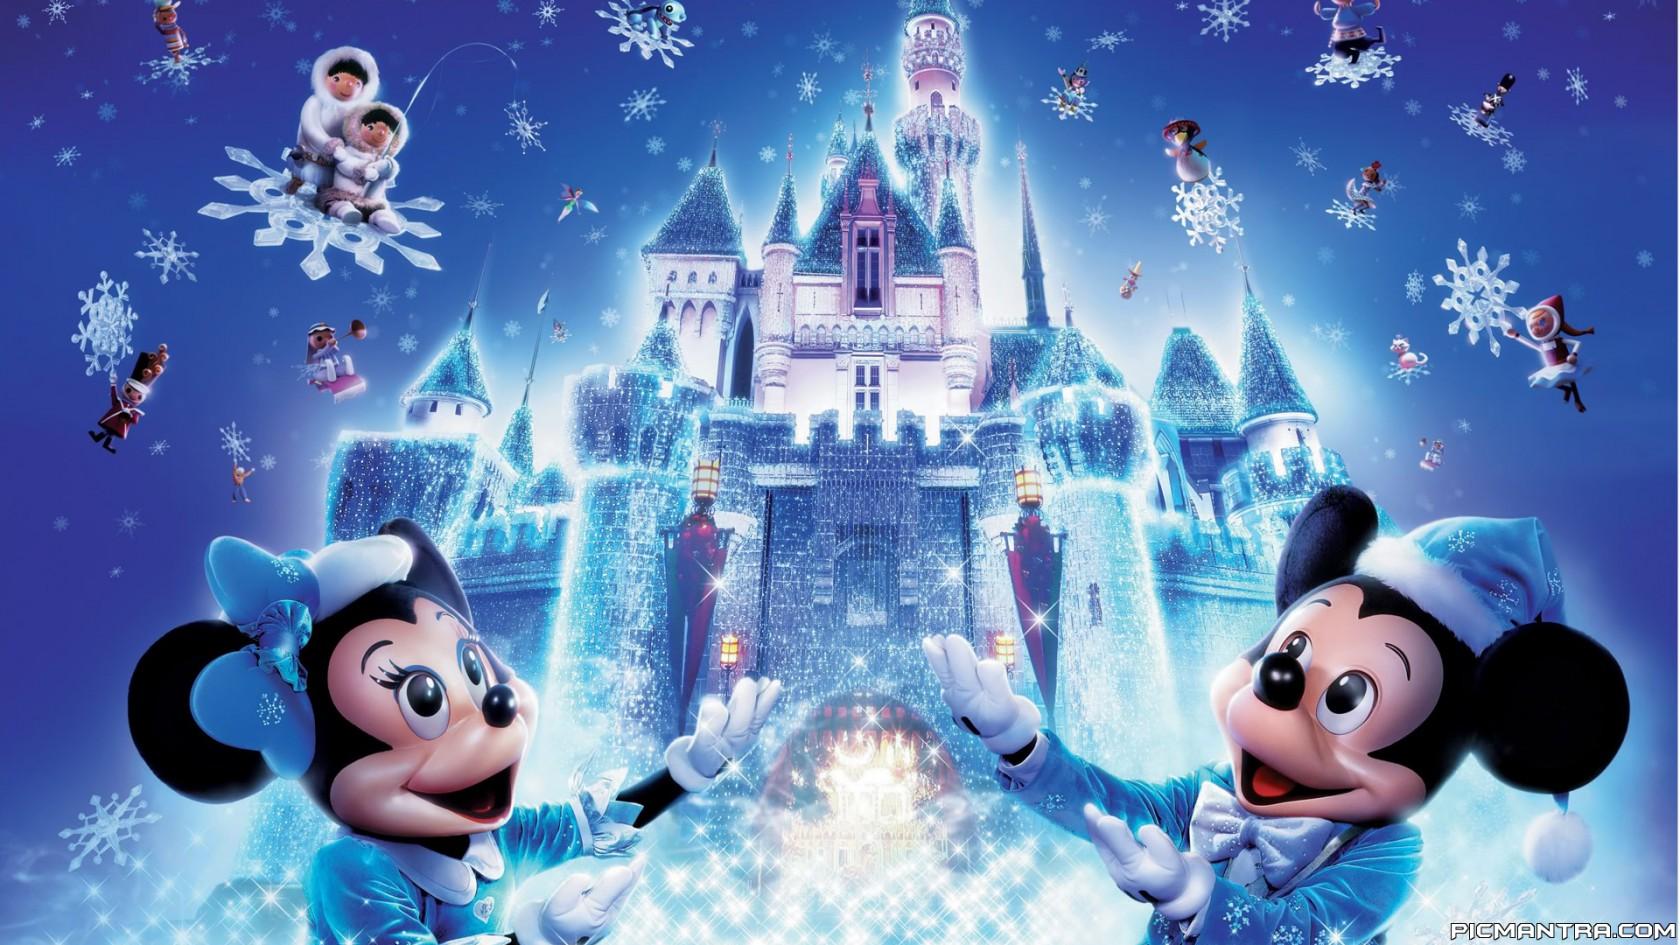 Animated Christmas Wallpapers Free (43 Wallpapers) – Adorable ...